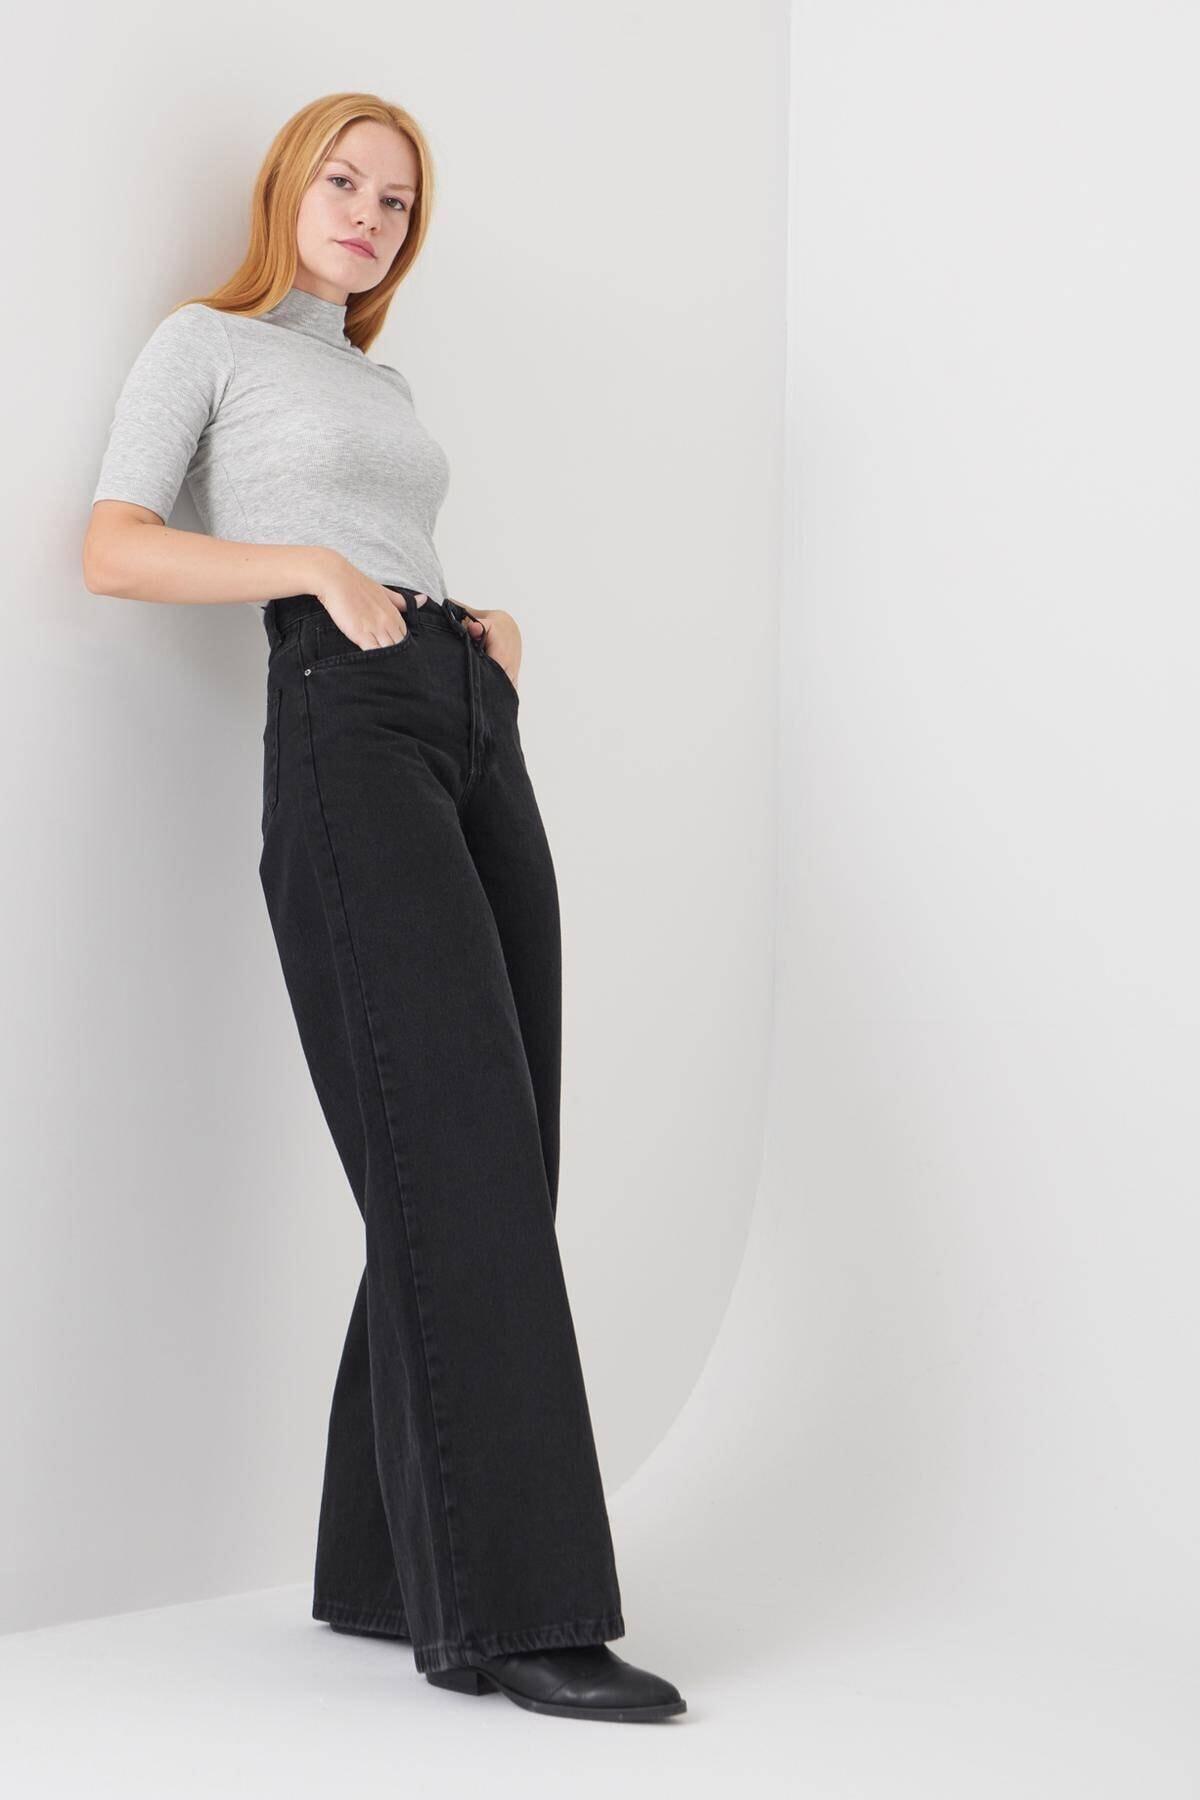 Addax Kadın Füme Cep Detaylı Bol Paça Pantolon Pn1072 - Pni ADX-0000023093 1